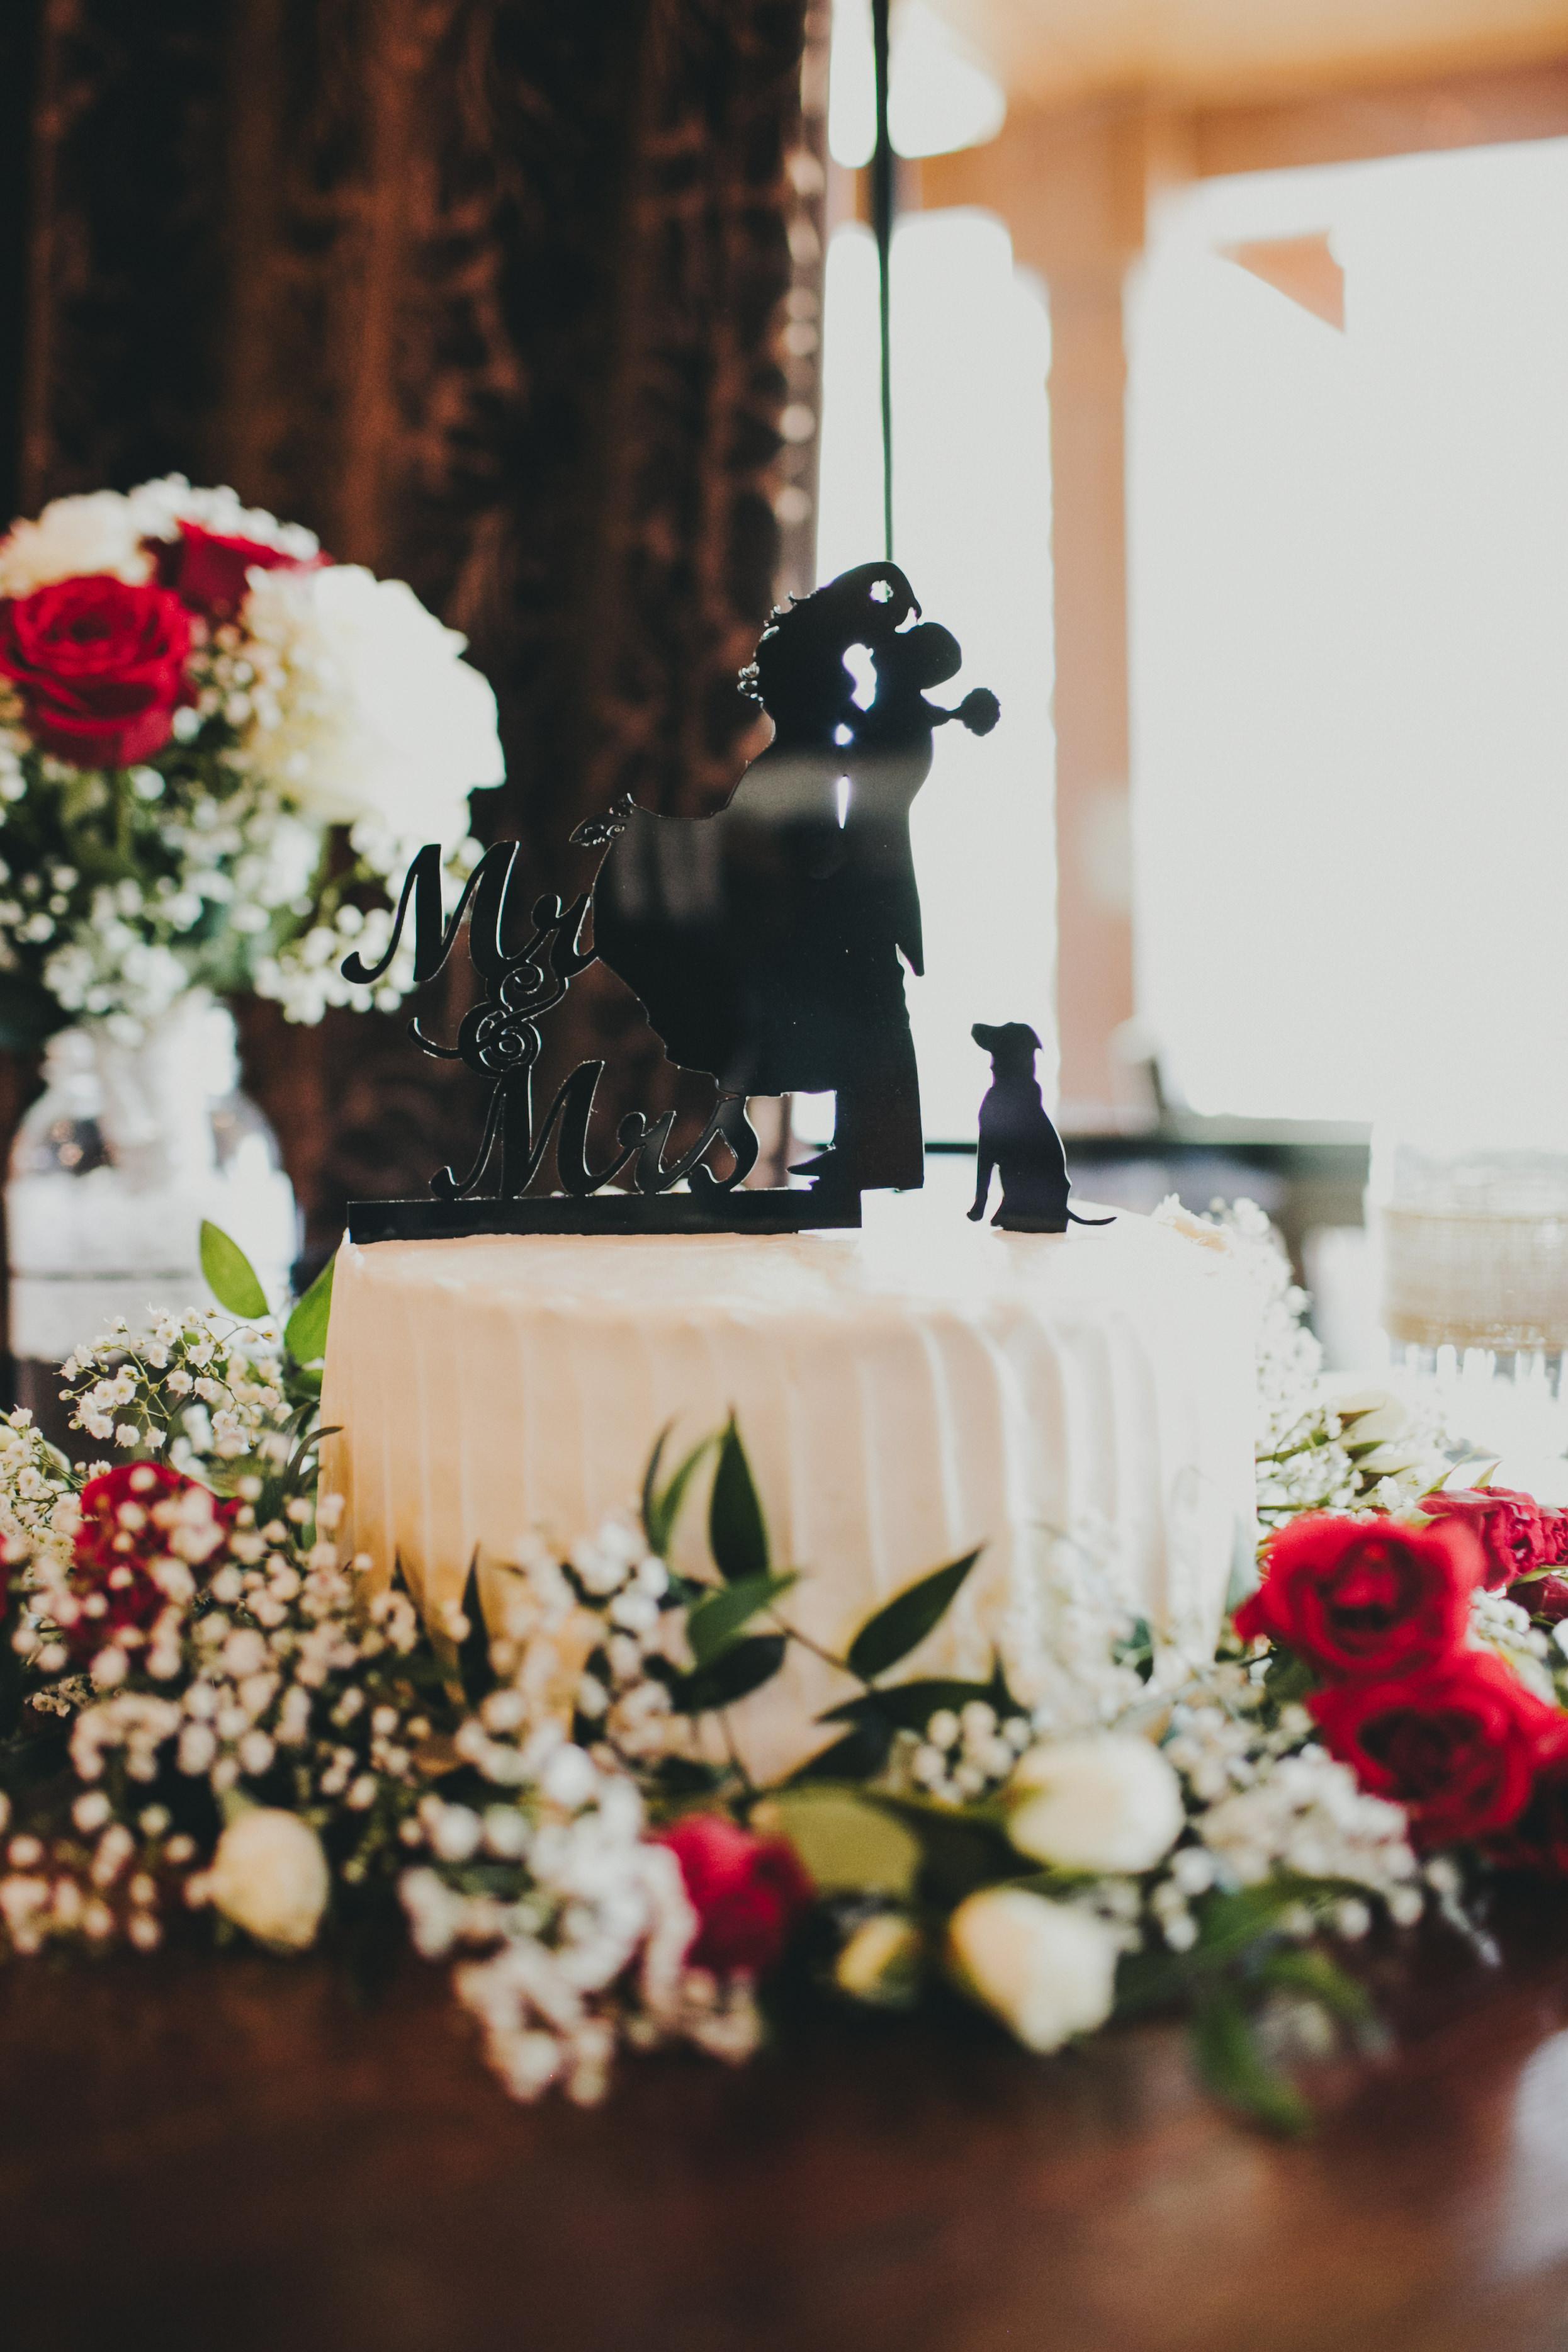 Cheyenne + Jordan - Wedding, Natalie Griffo (39 of 157).jpg